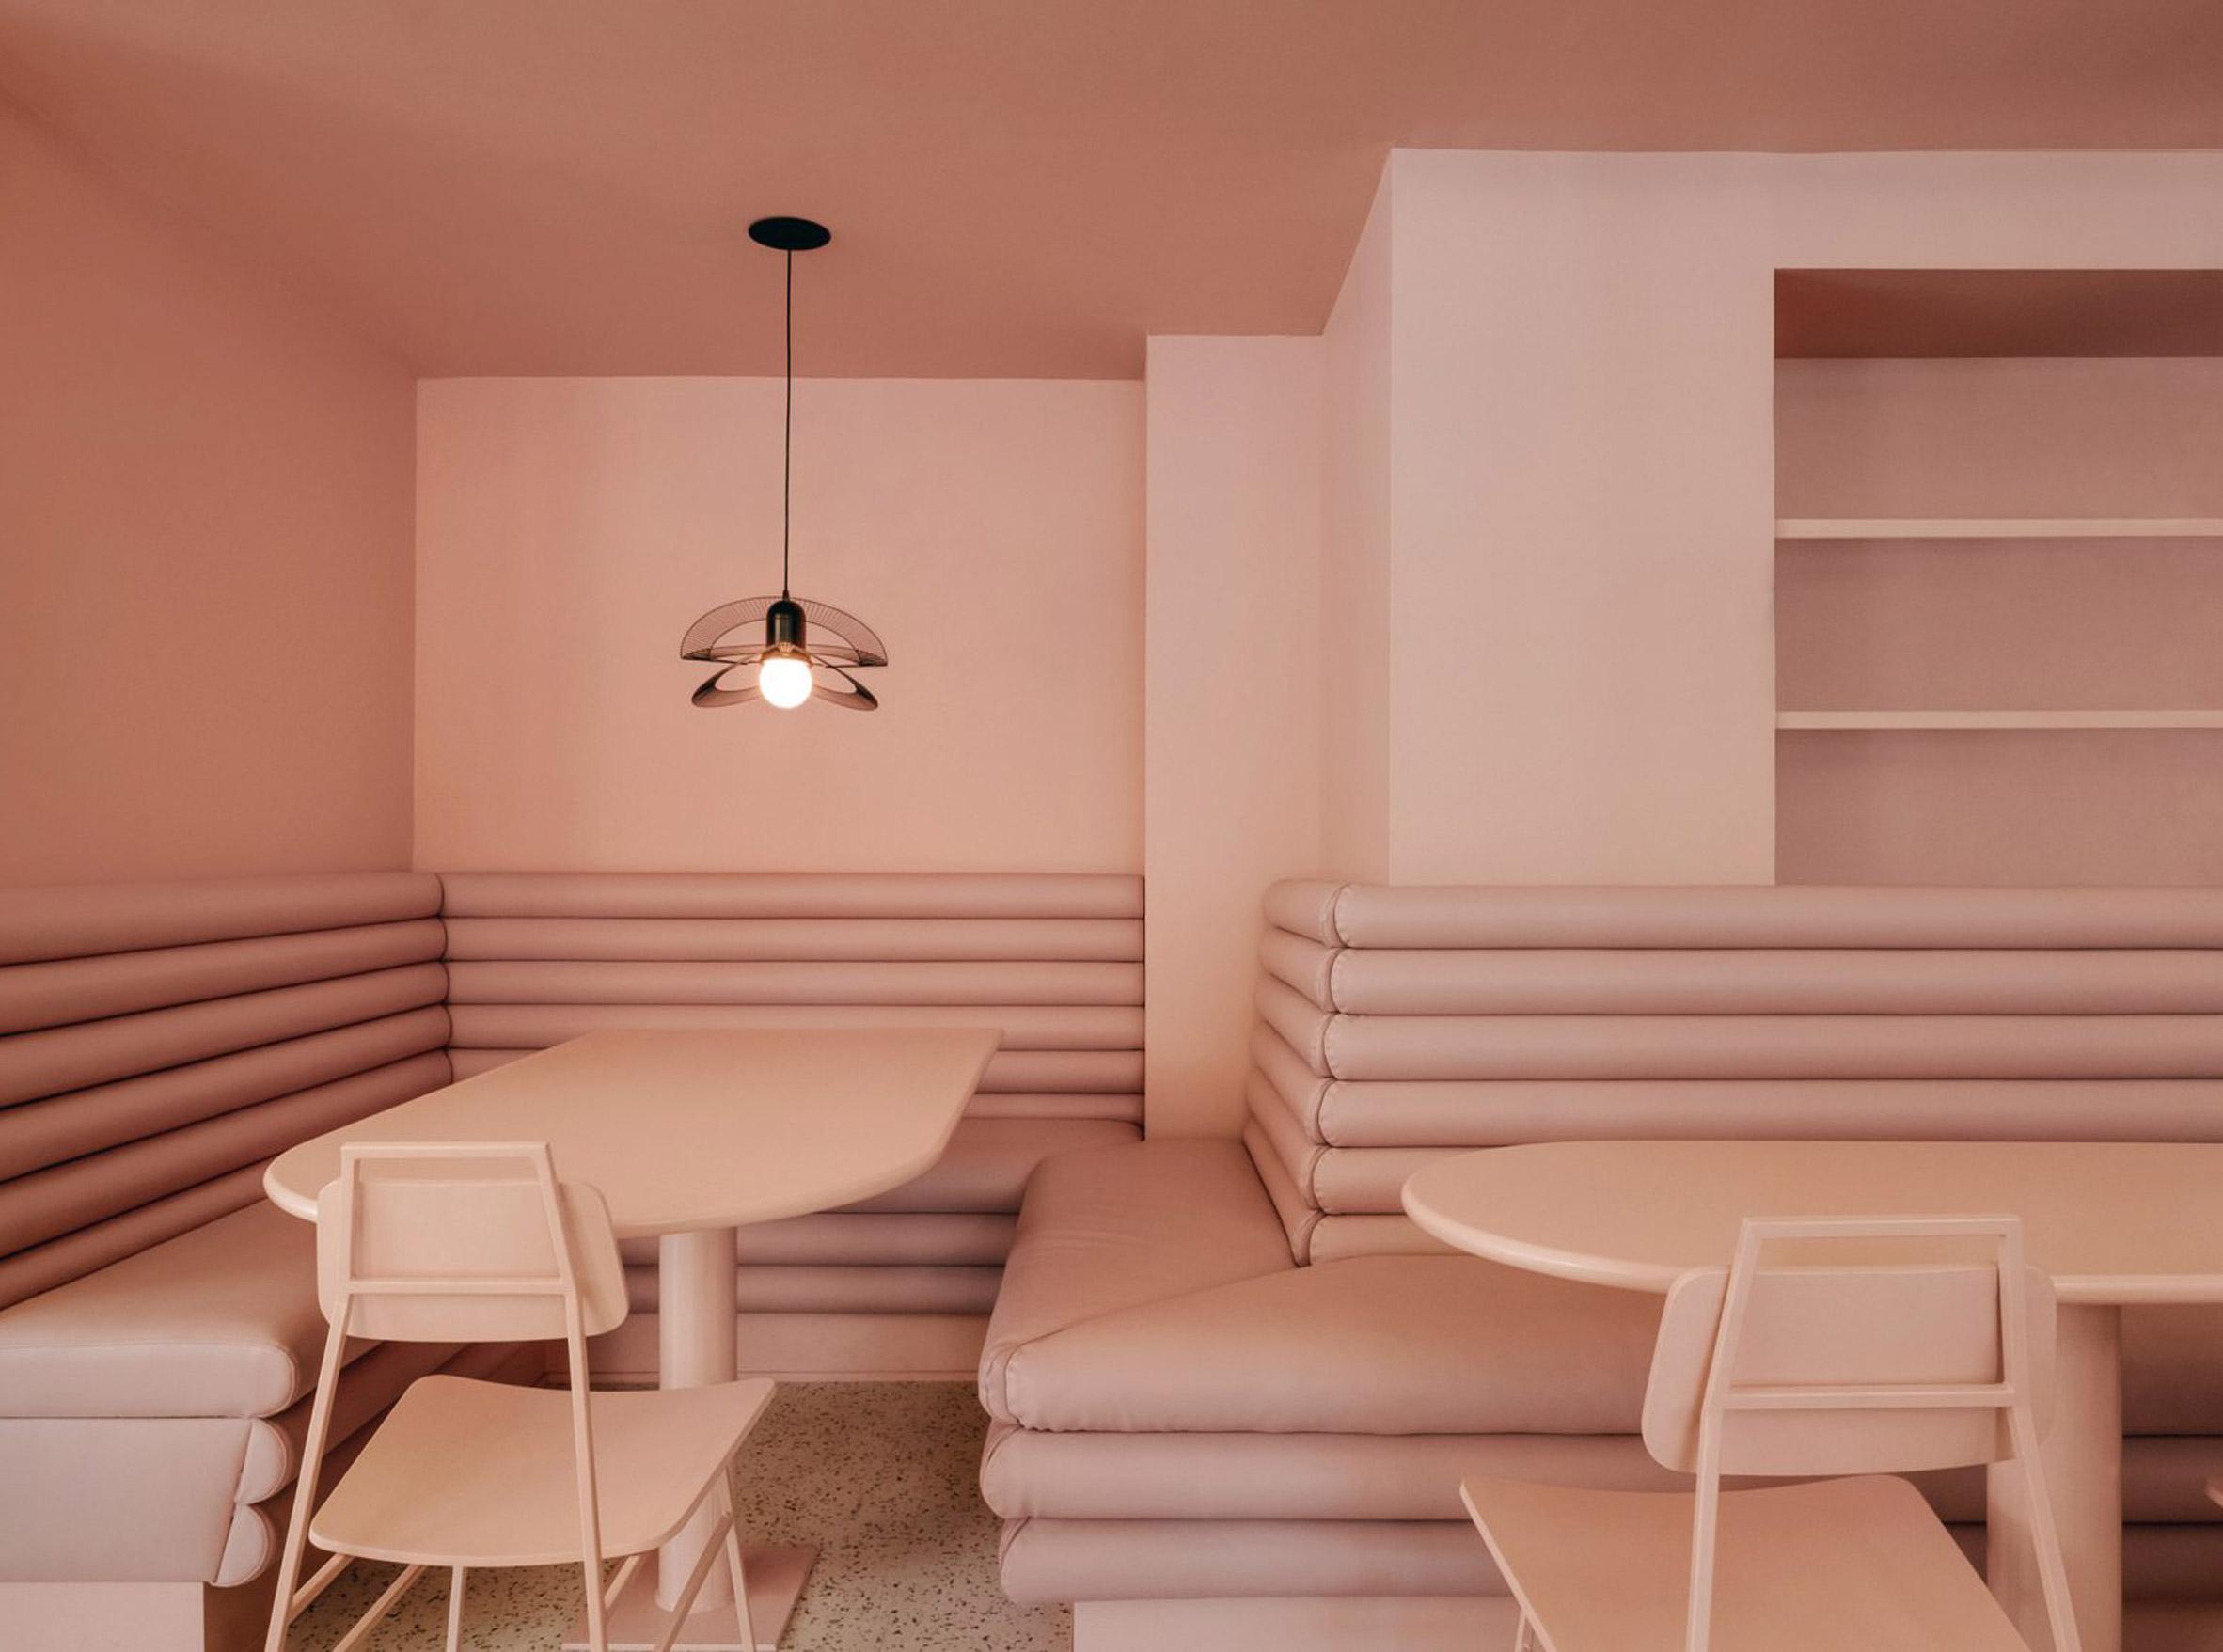 Paste Rita by Appareil Architecture